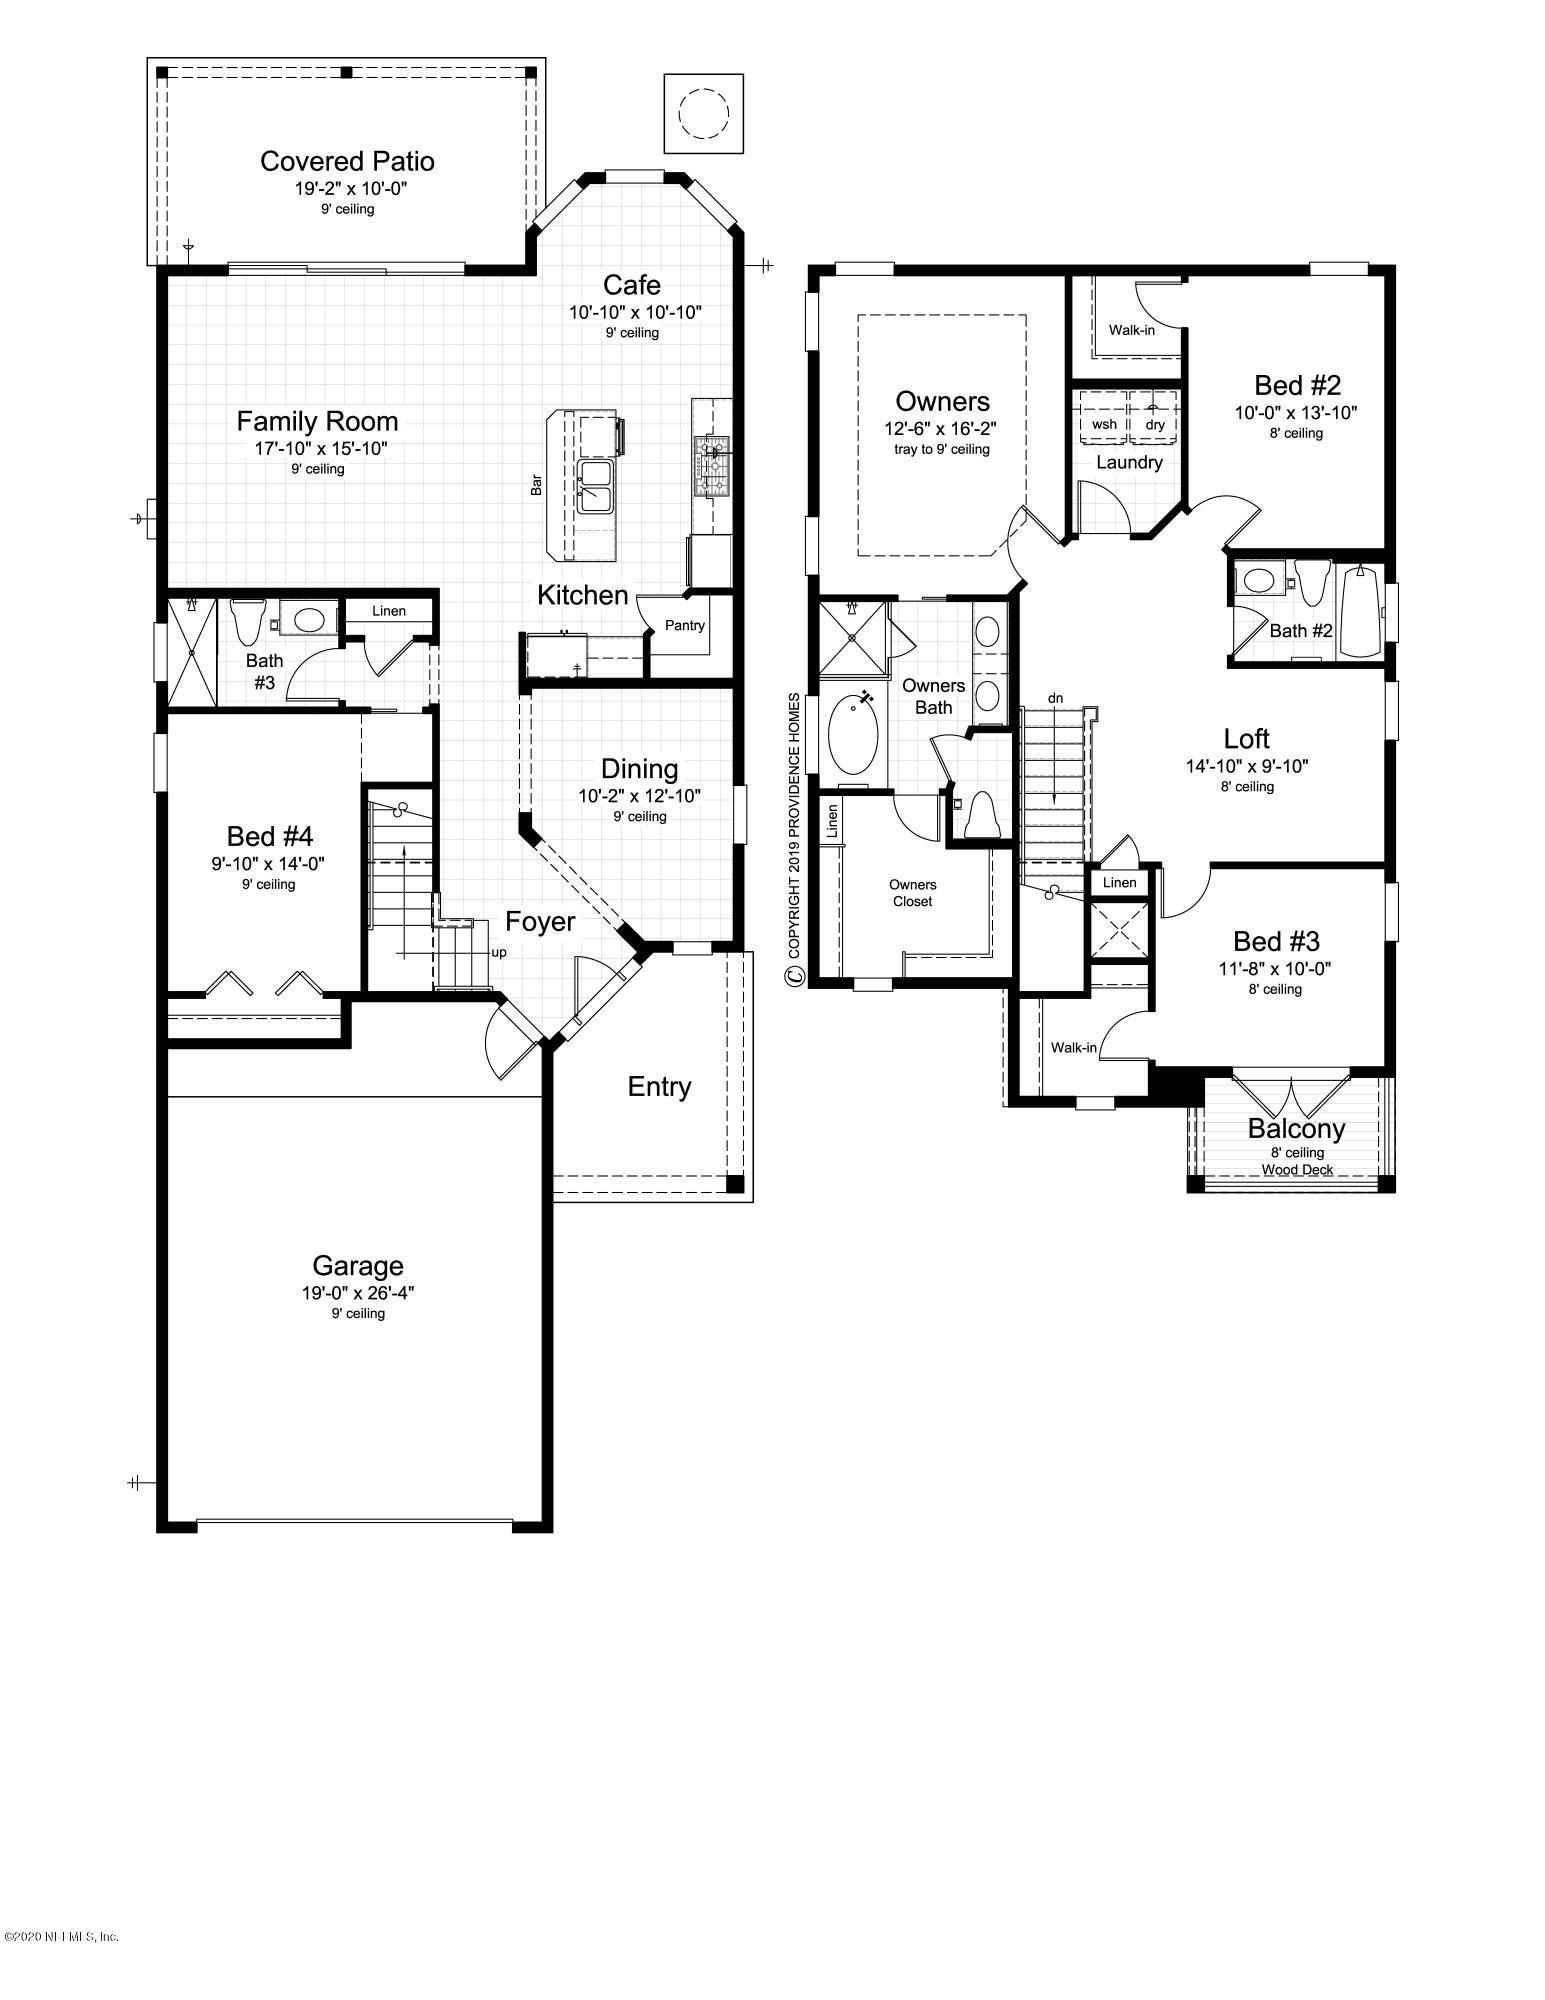 97 ANDESITE, PONTE VEDRA, FLORIDA 32081, 4 Bedrooms Bedrooms, ,3 BathroomsBathrooms,Residential,For sale,ANDESITE,1056691